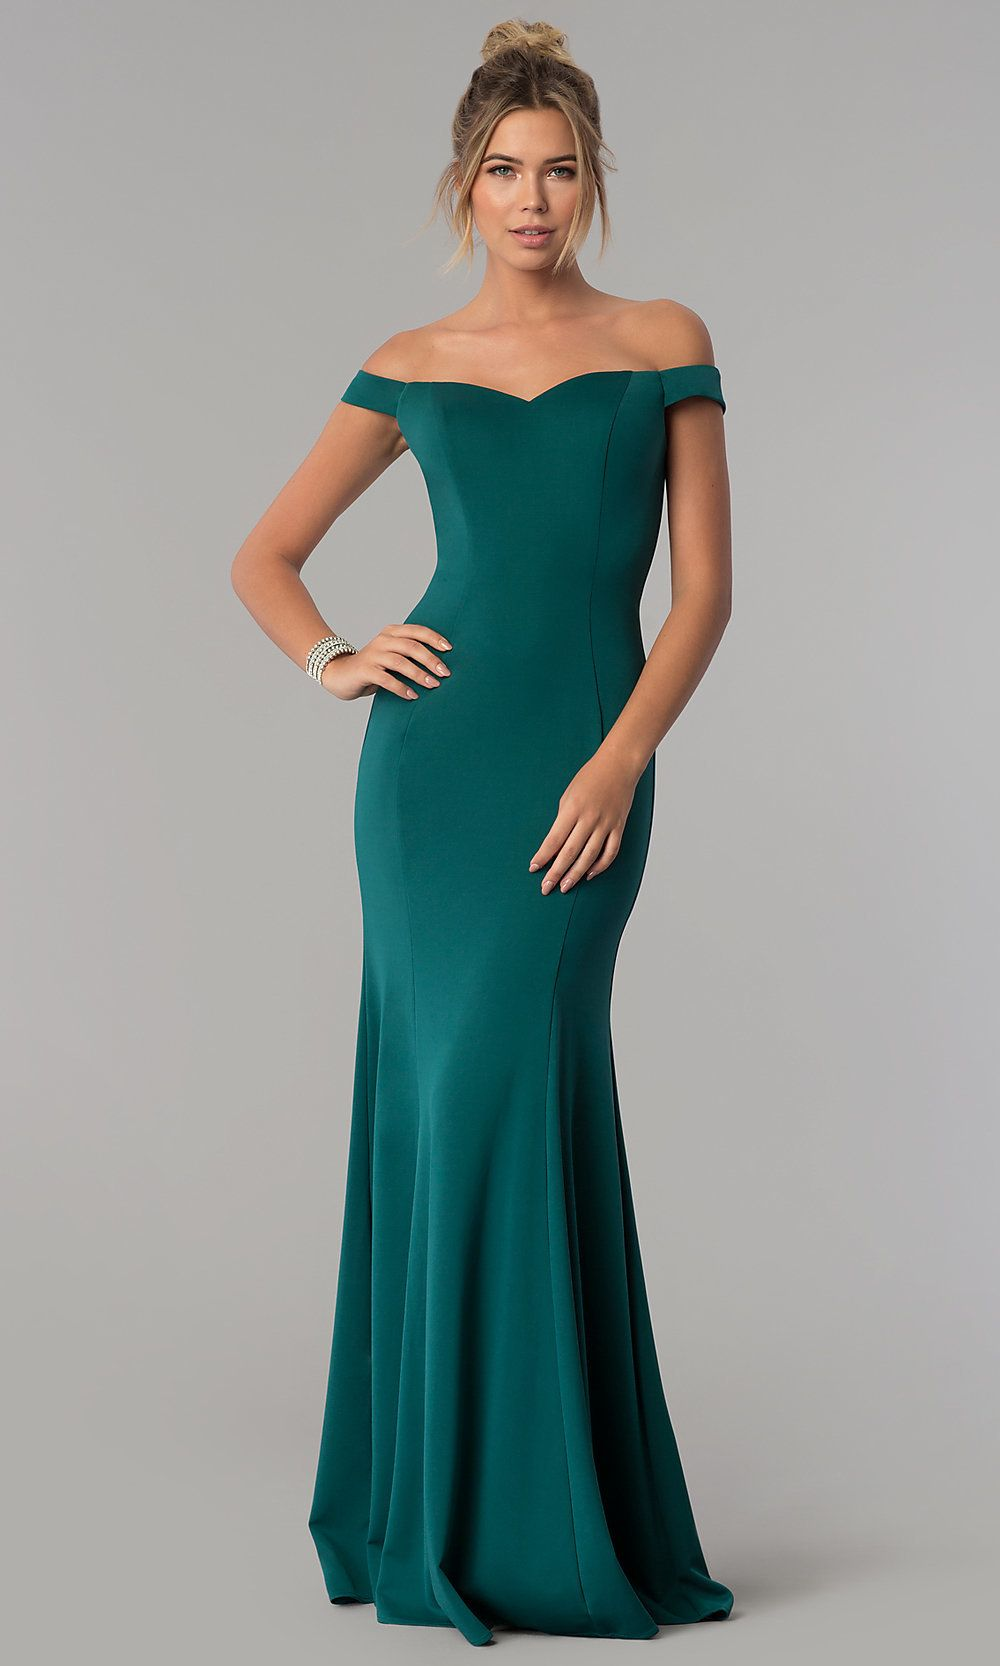 Uitgelezene Floor-Length Off-the-Shoulder Mermaid Formal Dress | Jurken ER-46